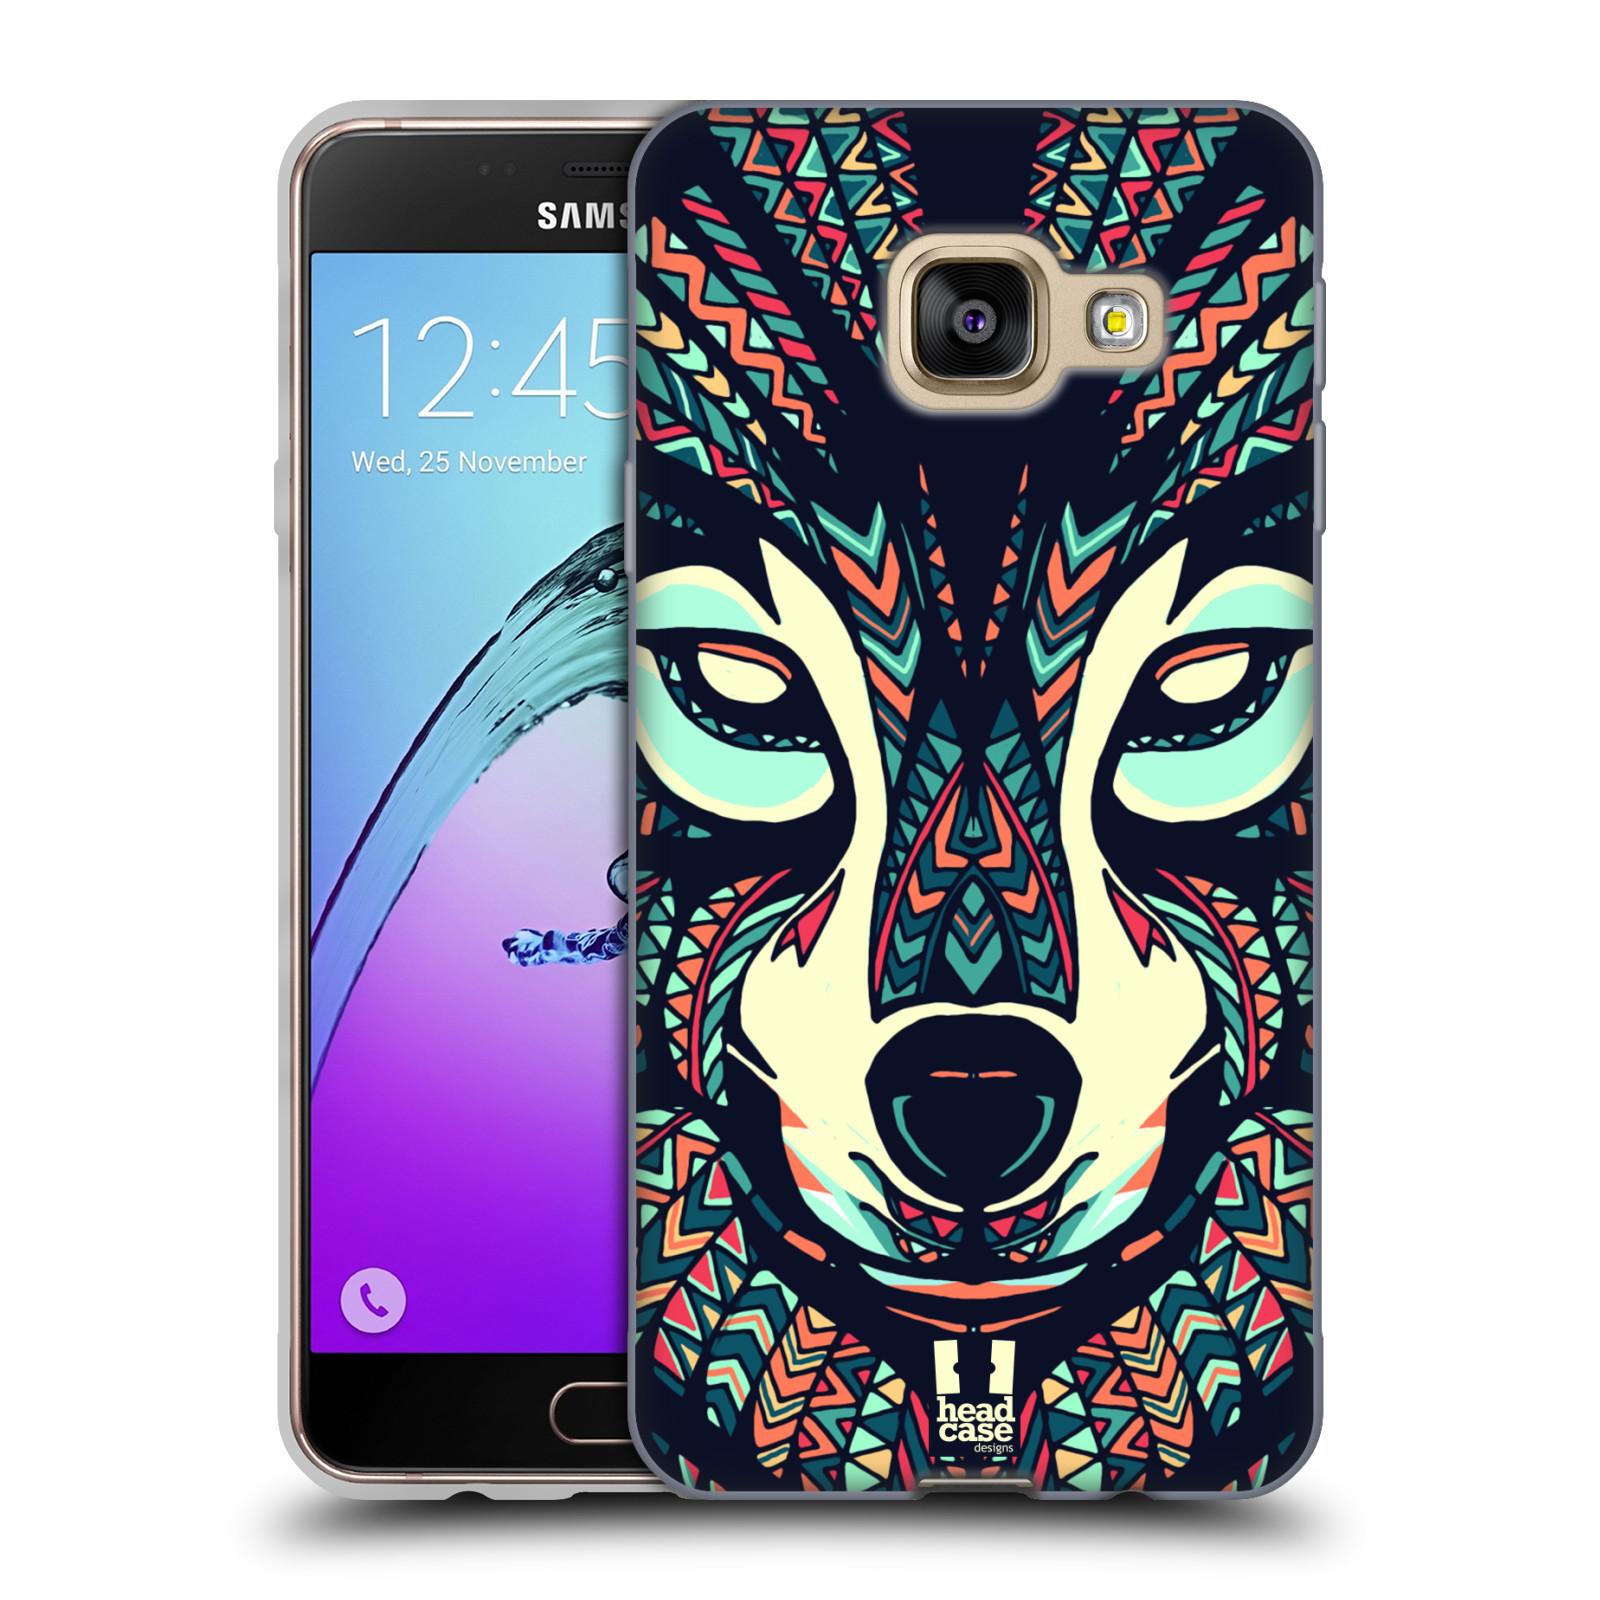 Silikonové pouzdro na mobil Samsung Galaxy A3 (2016) HEAD CASE AZTEC VLK